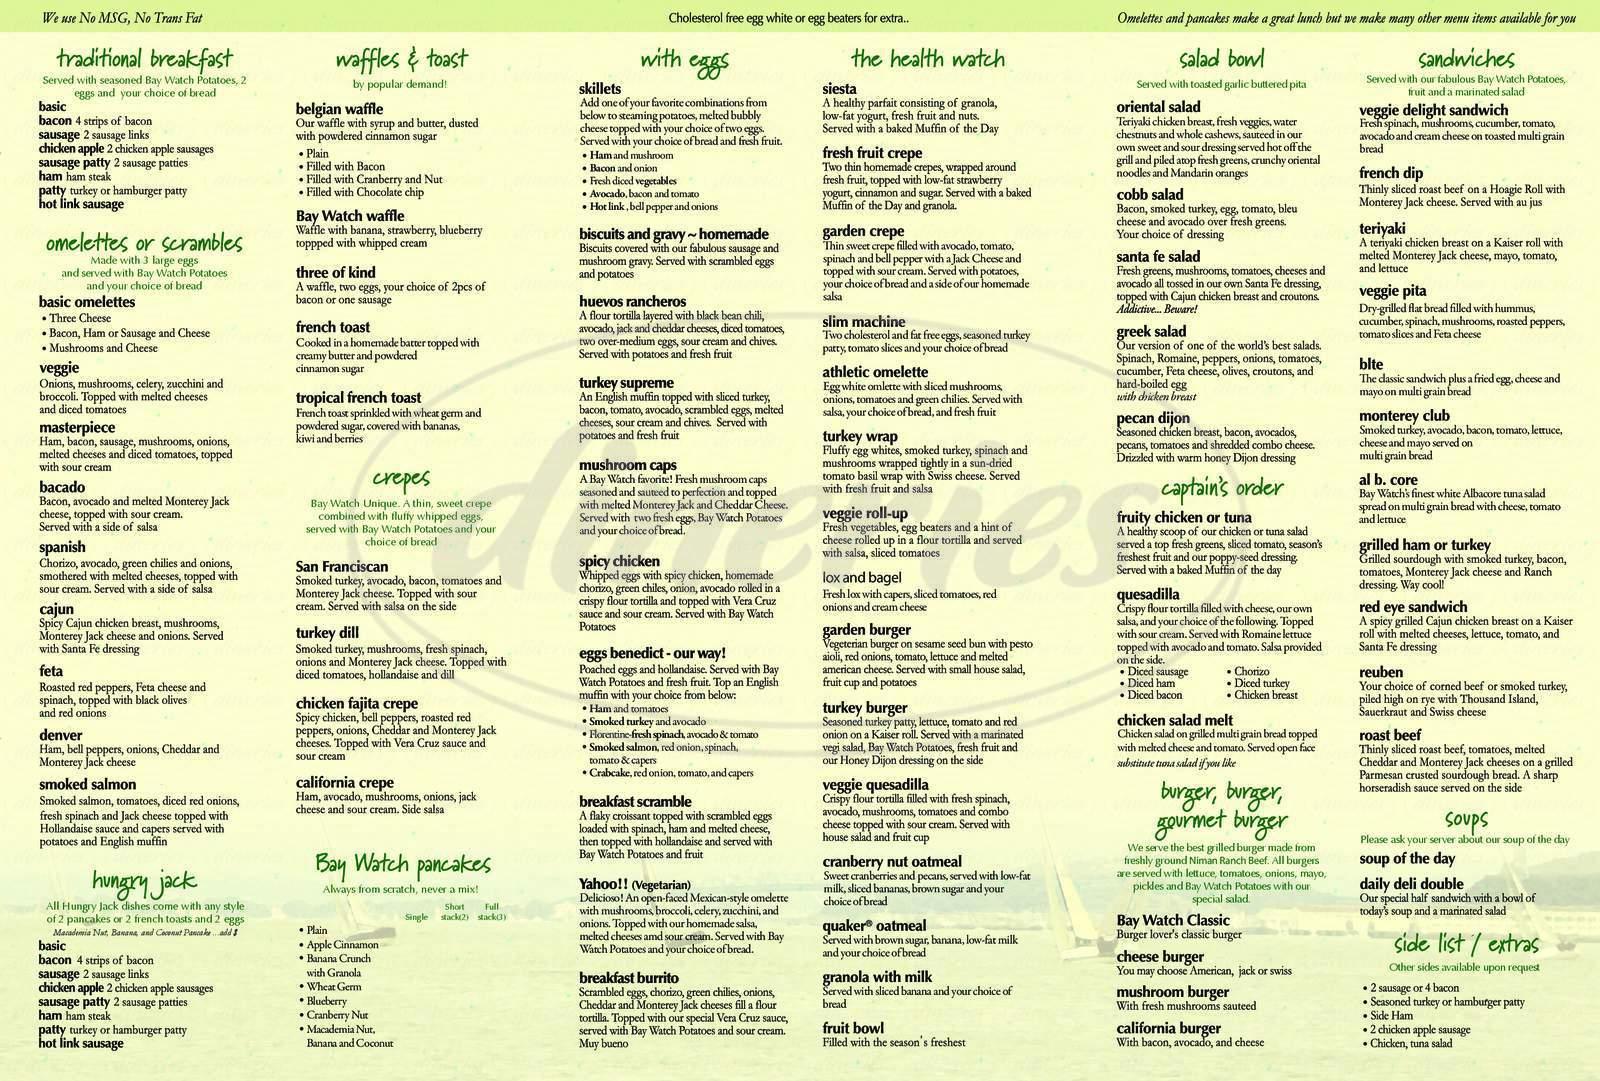 menu for Bay Watch